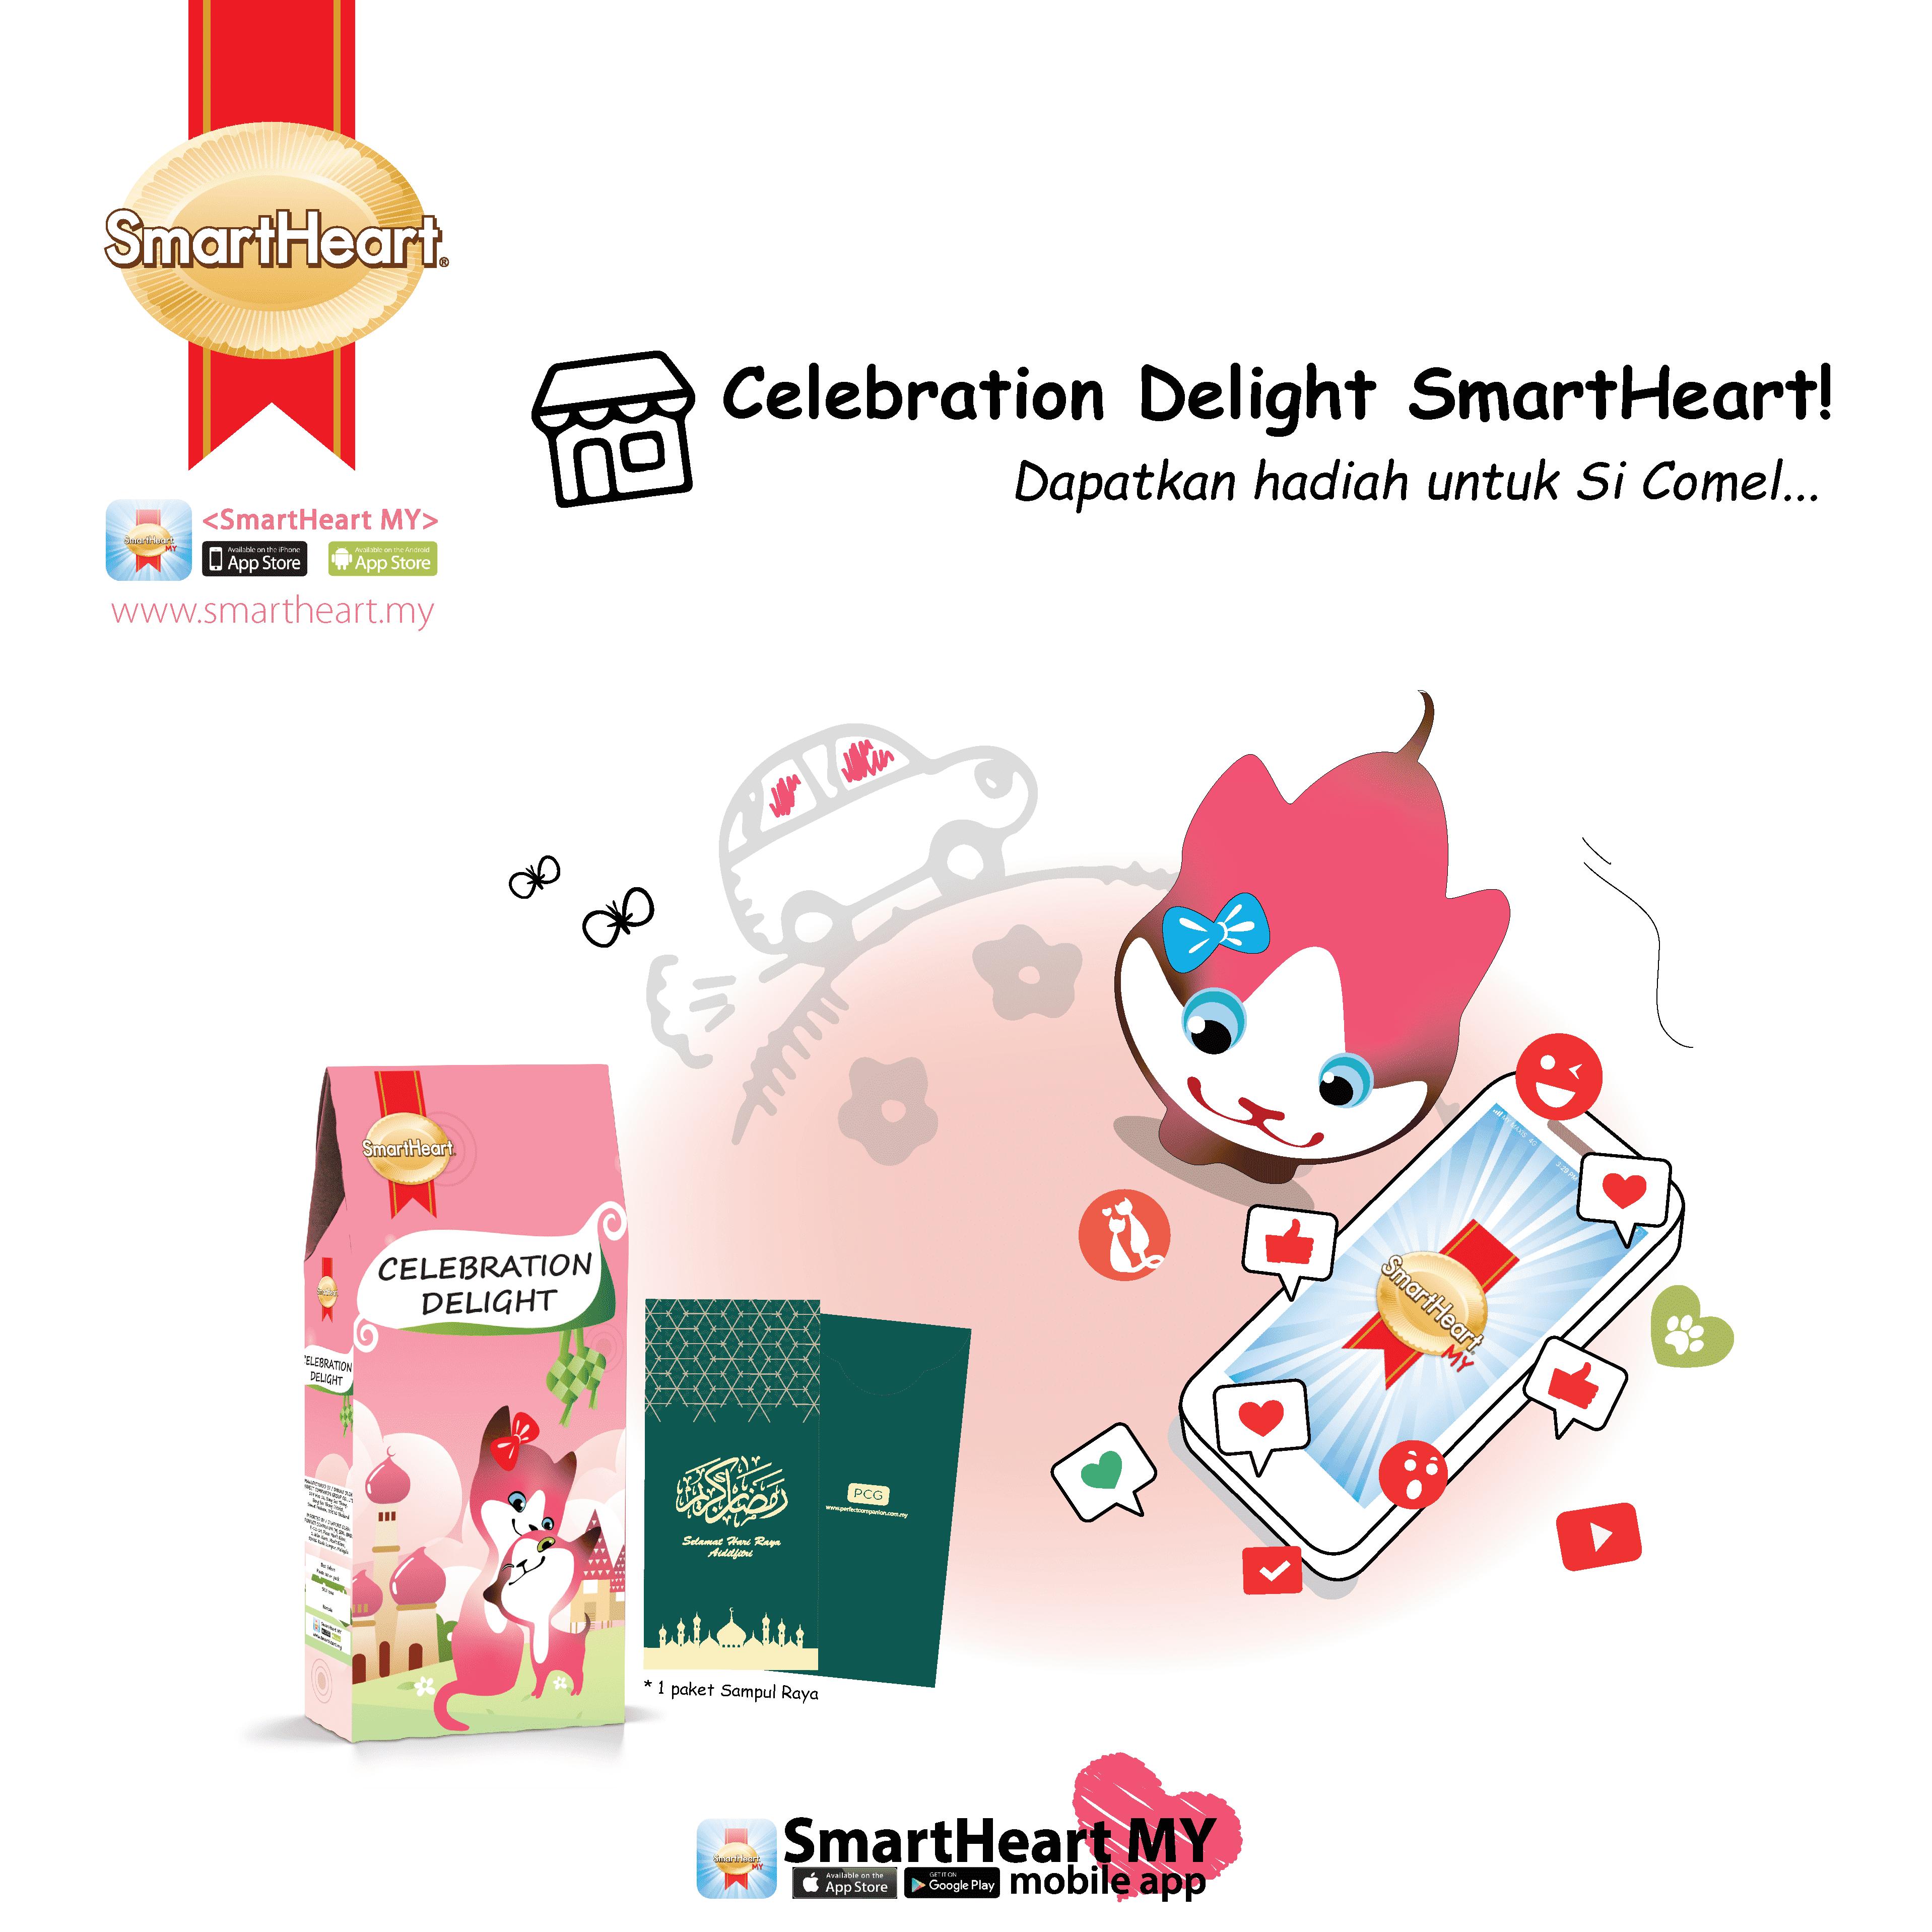 SmartHeart Celebration Delight